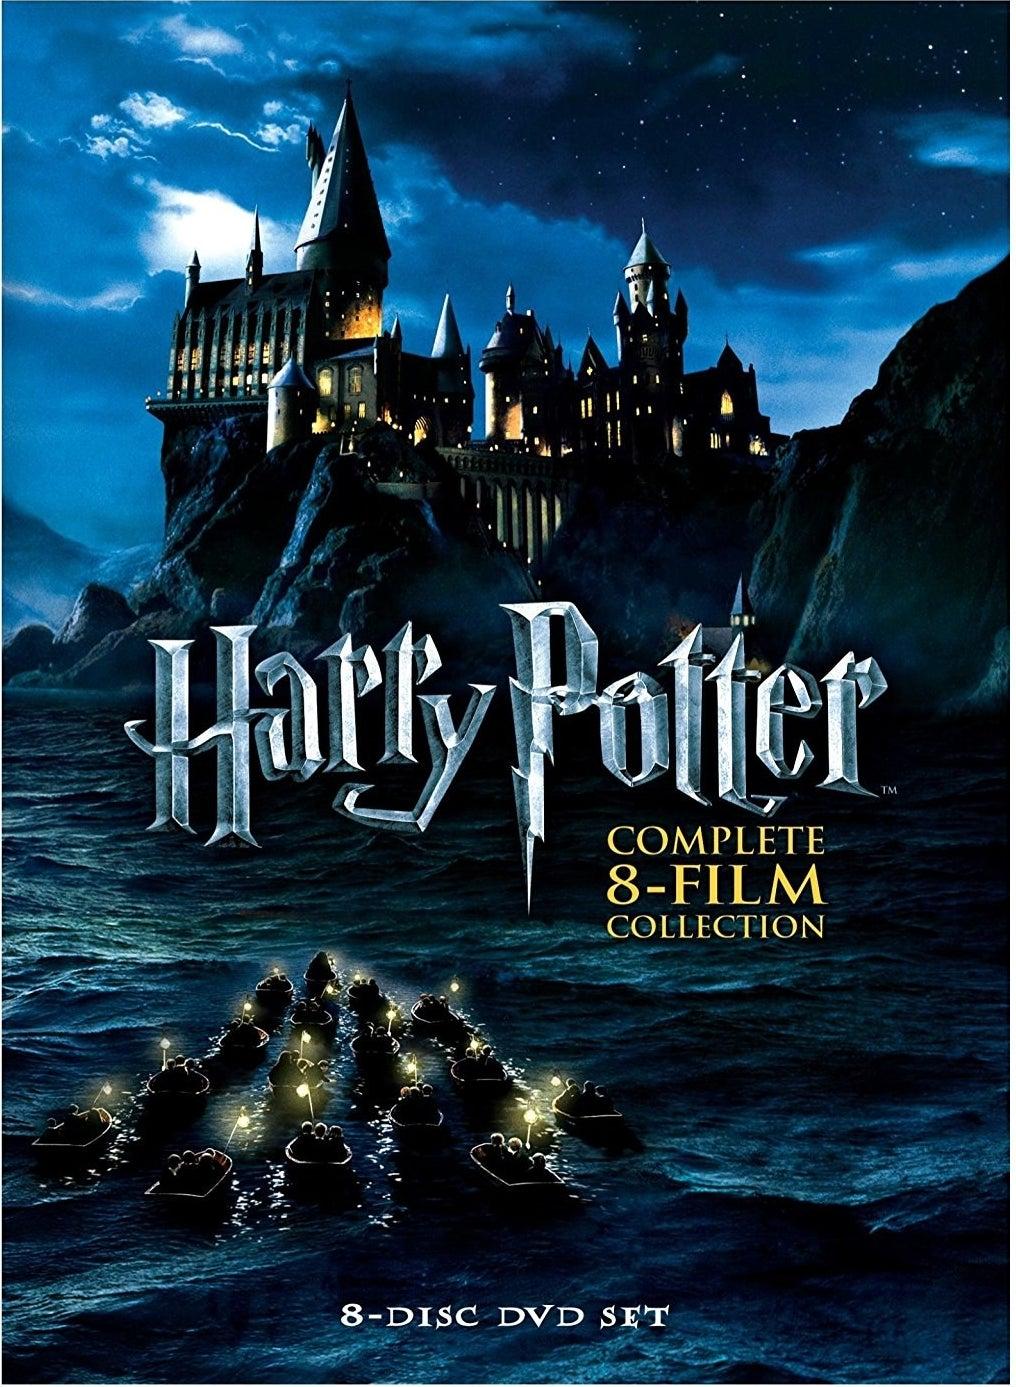 the DVD set